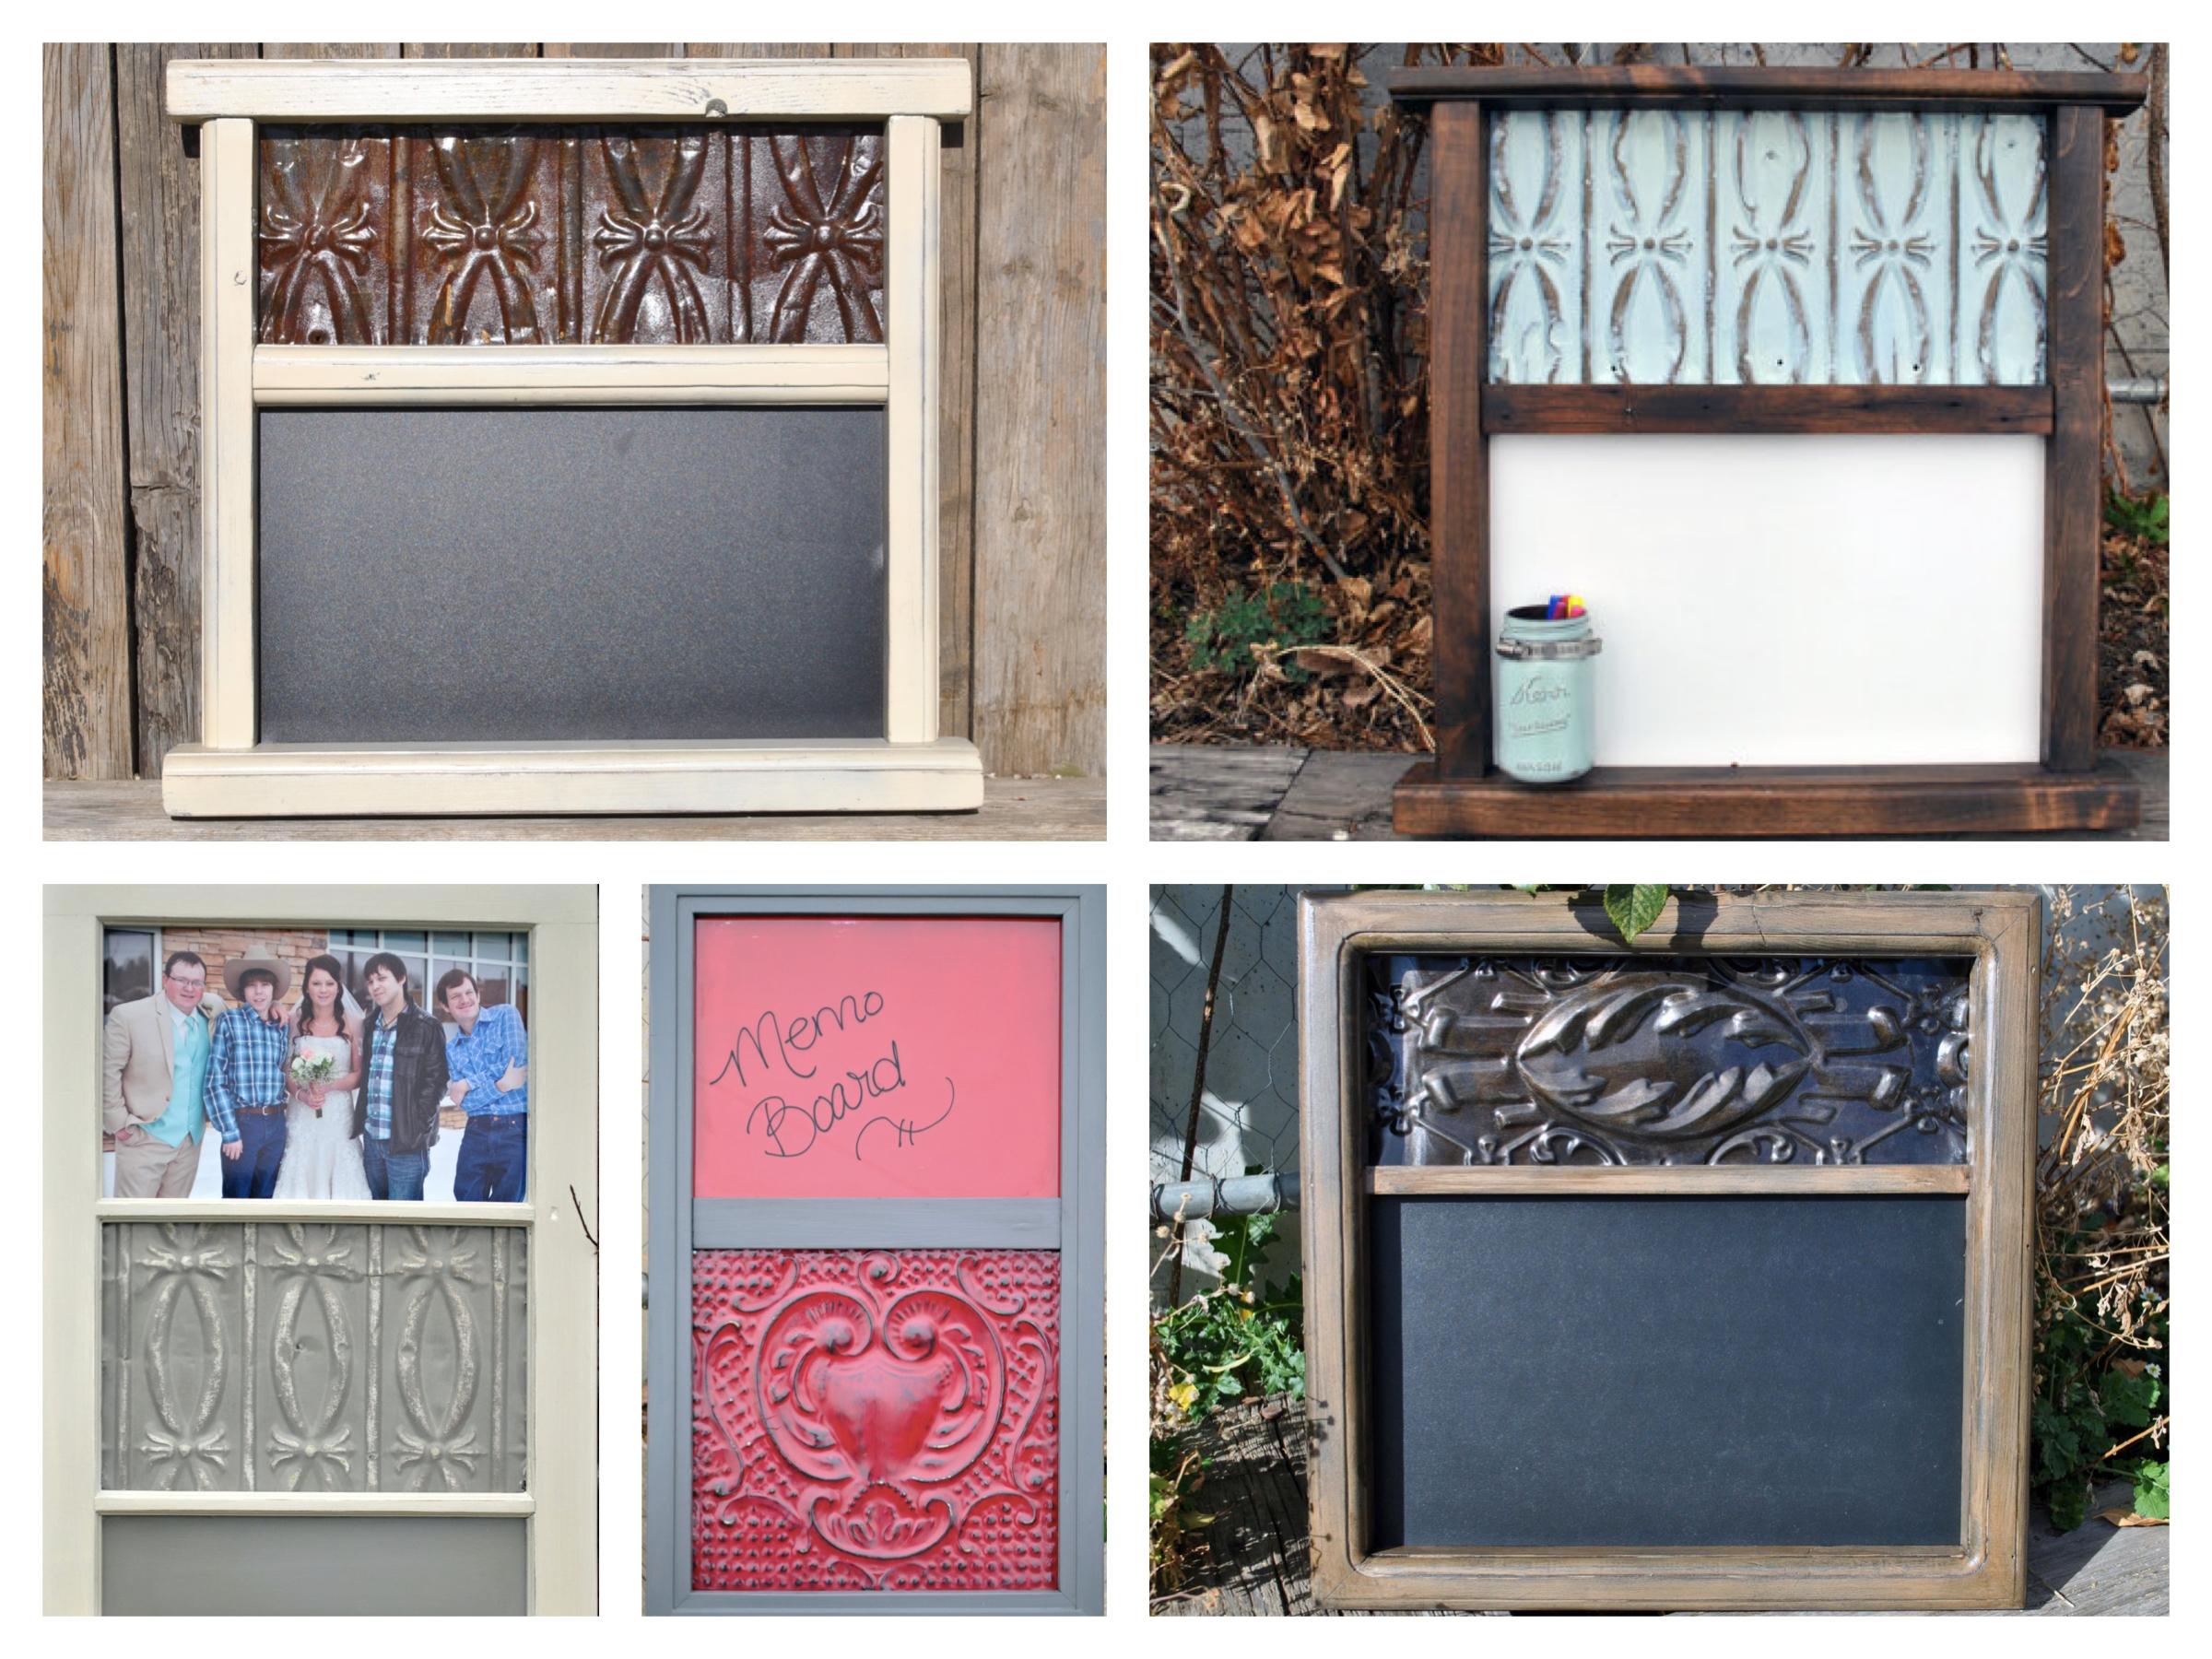 Ceiling Tile Picture Frames